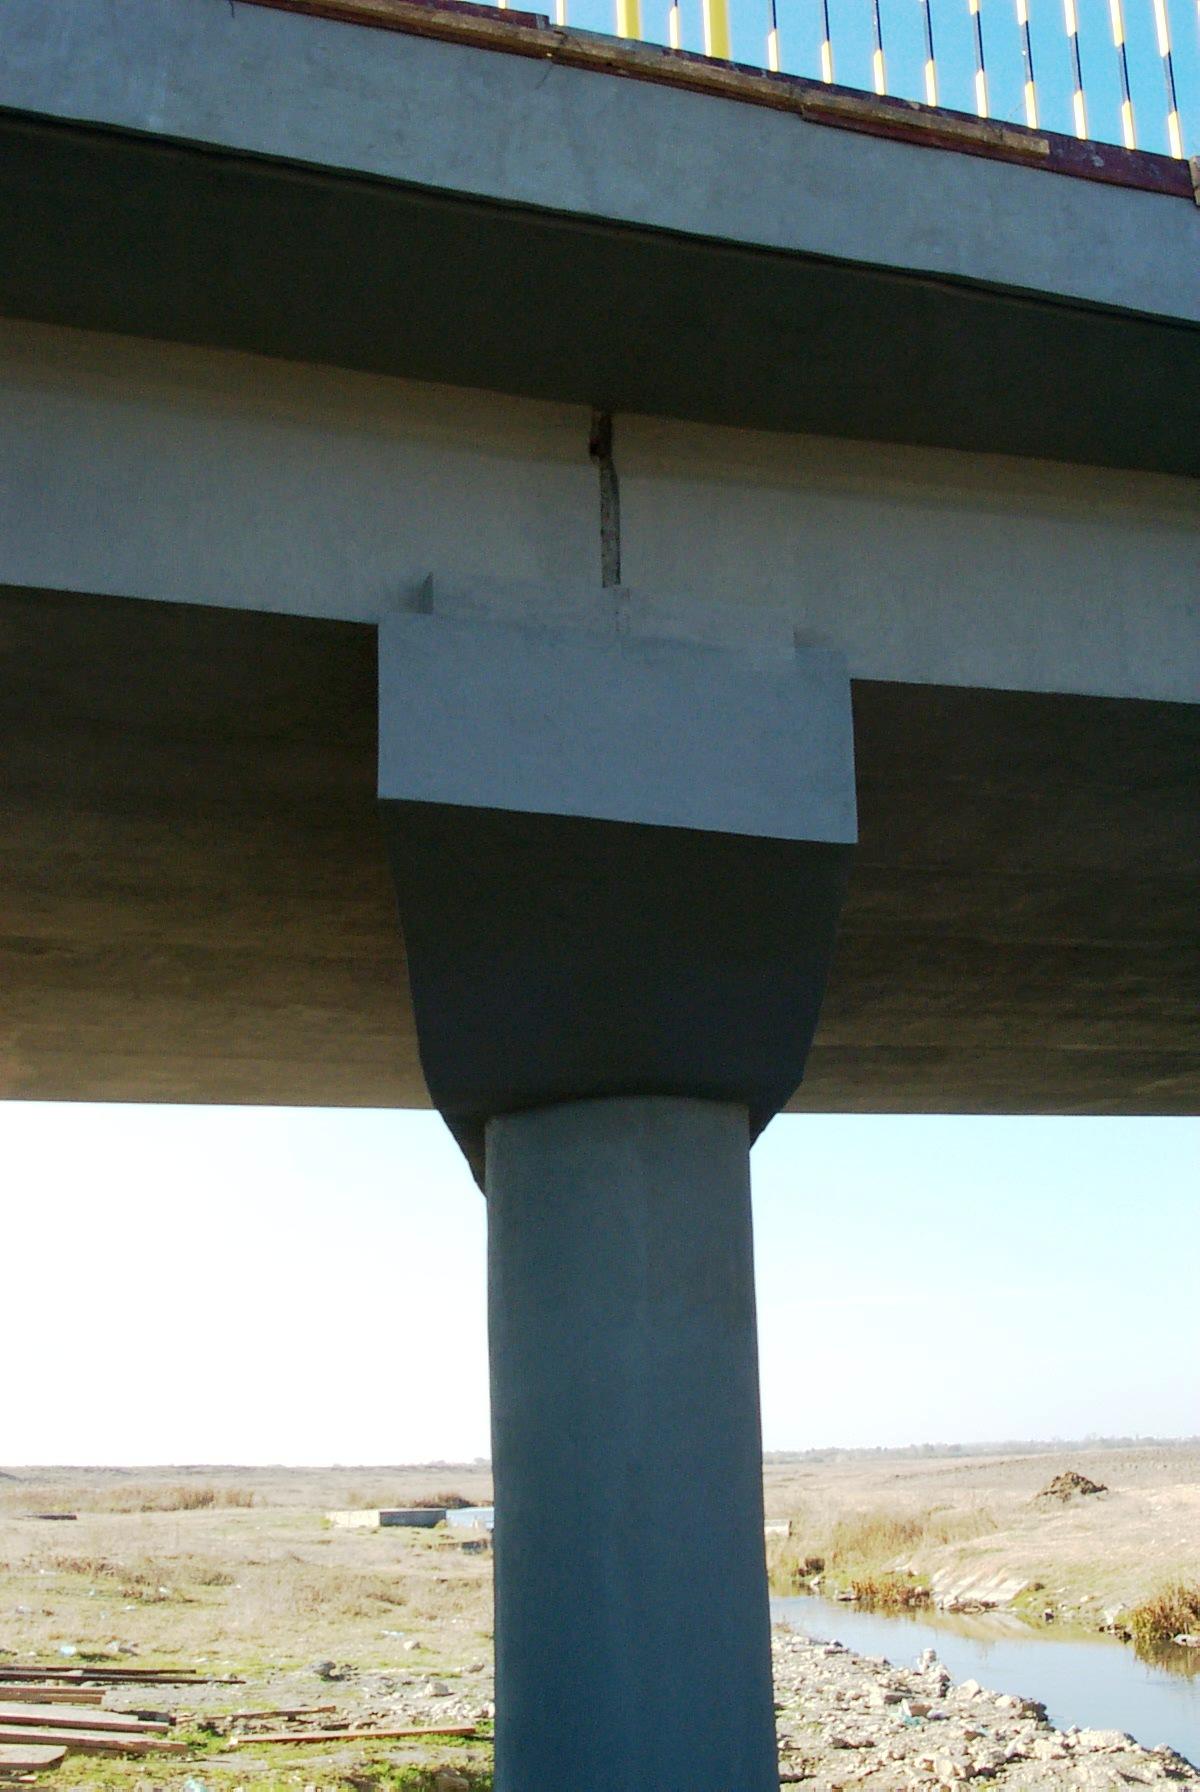 Reparatii pod (DN2), Km. 33 - 028, peste raul Calnistea MAPEI - Poza 123